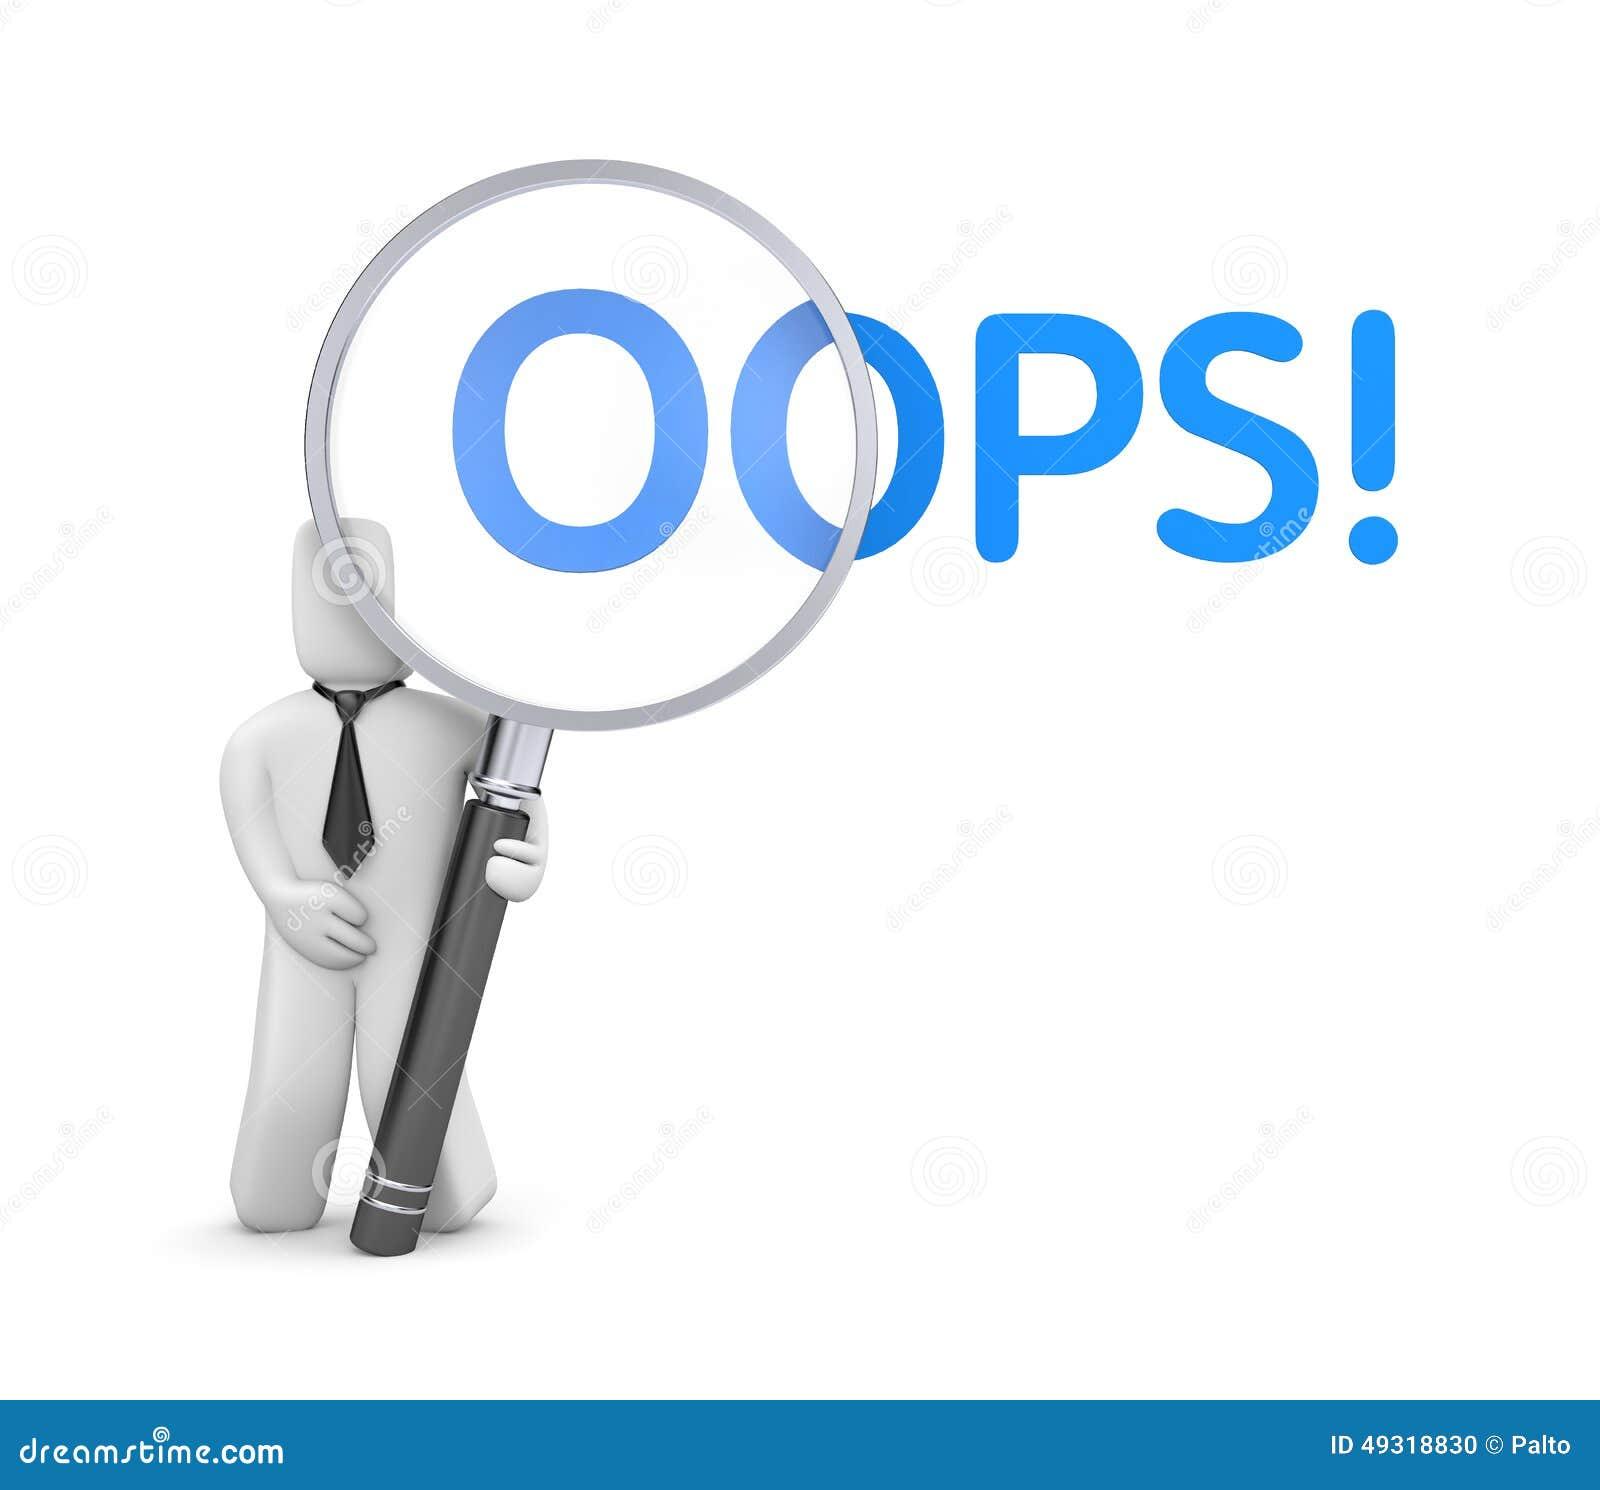 Oops Sorry Business Man Cartoon Vector | CartoonDealer.com ...  Oops Sorry Busi...